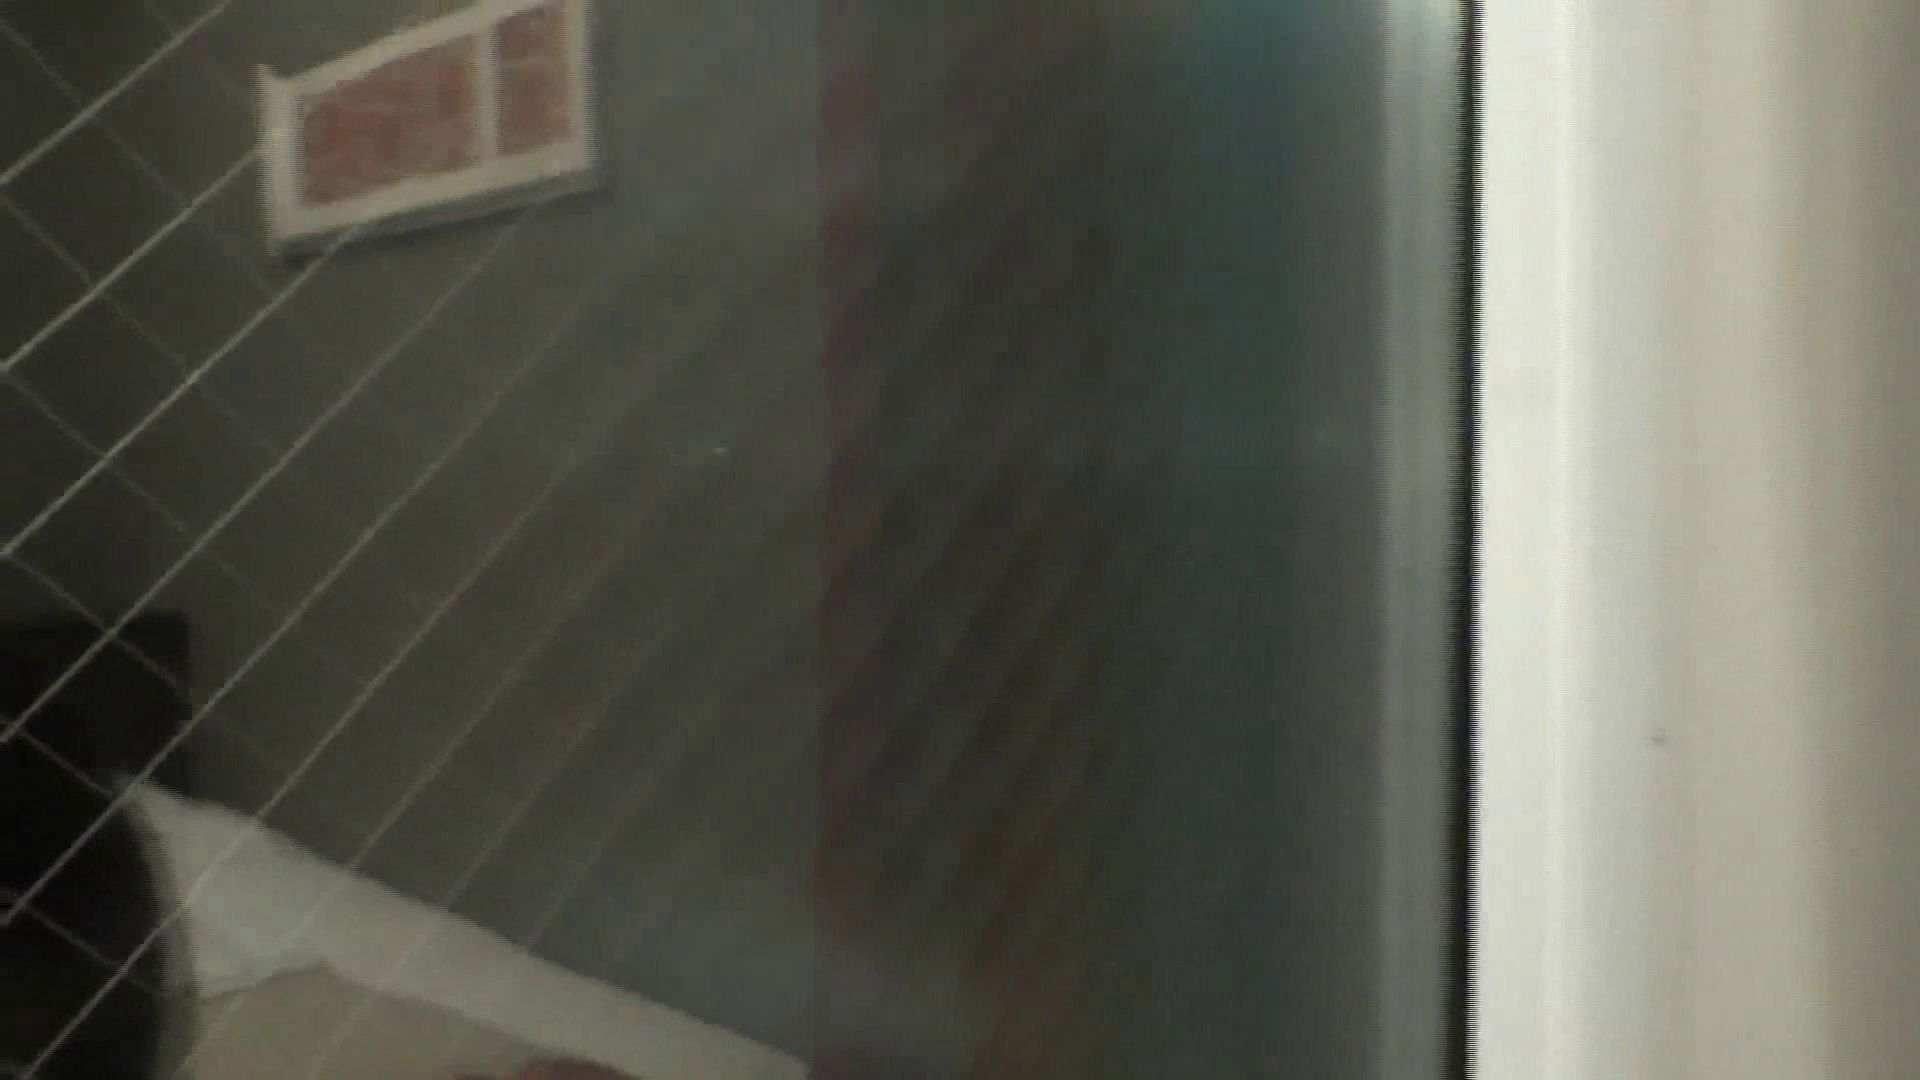 S級厳選美女ビッチガールVol.08 エロティックなOL おまんこ無修正動画無料 76画像 18